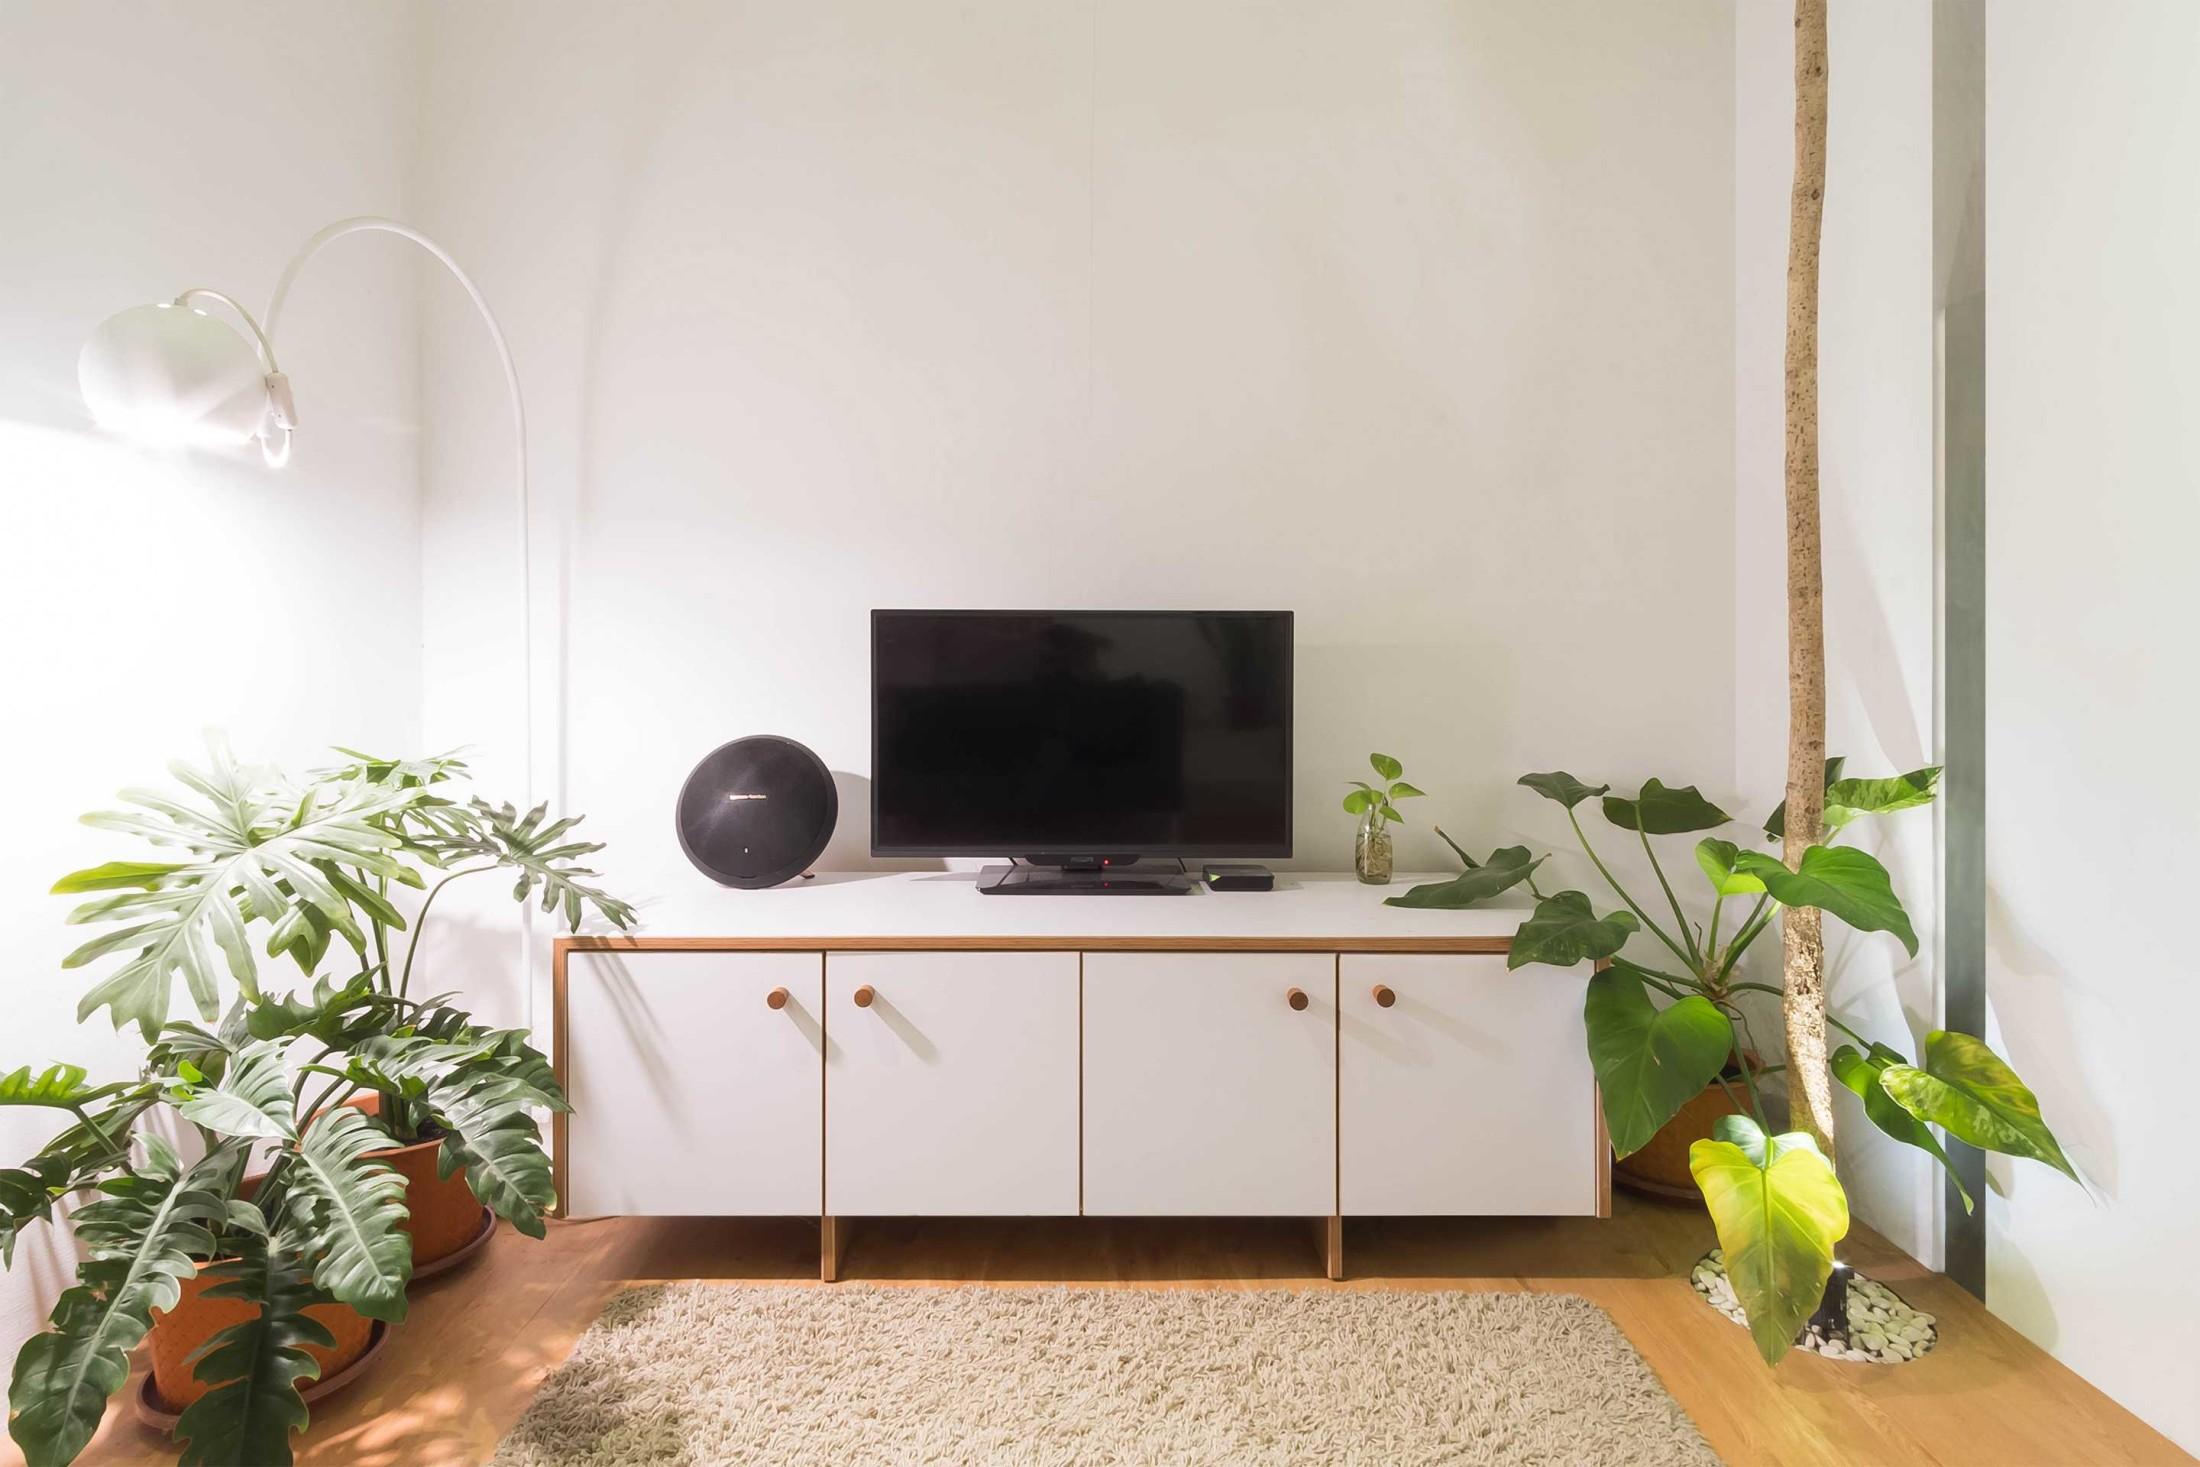 Tanaman unik untuk pelengkap desain interior yang apik (Sumber: arsitag.com)